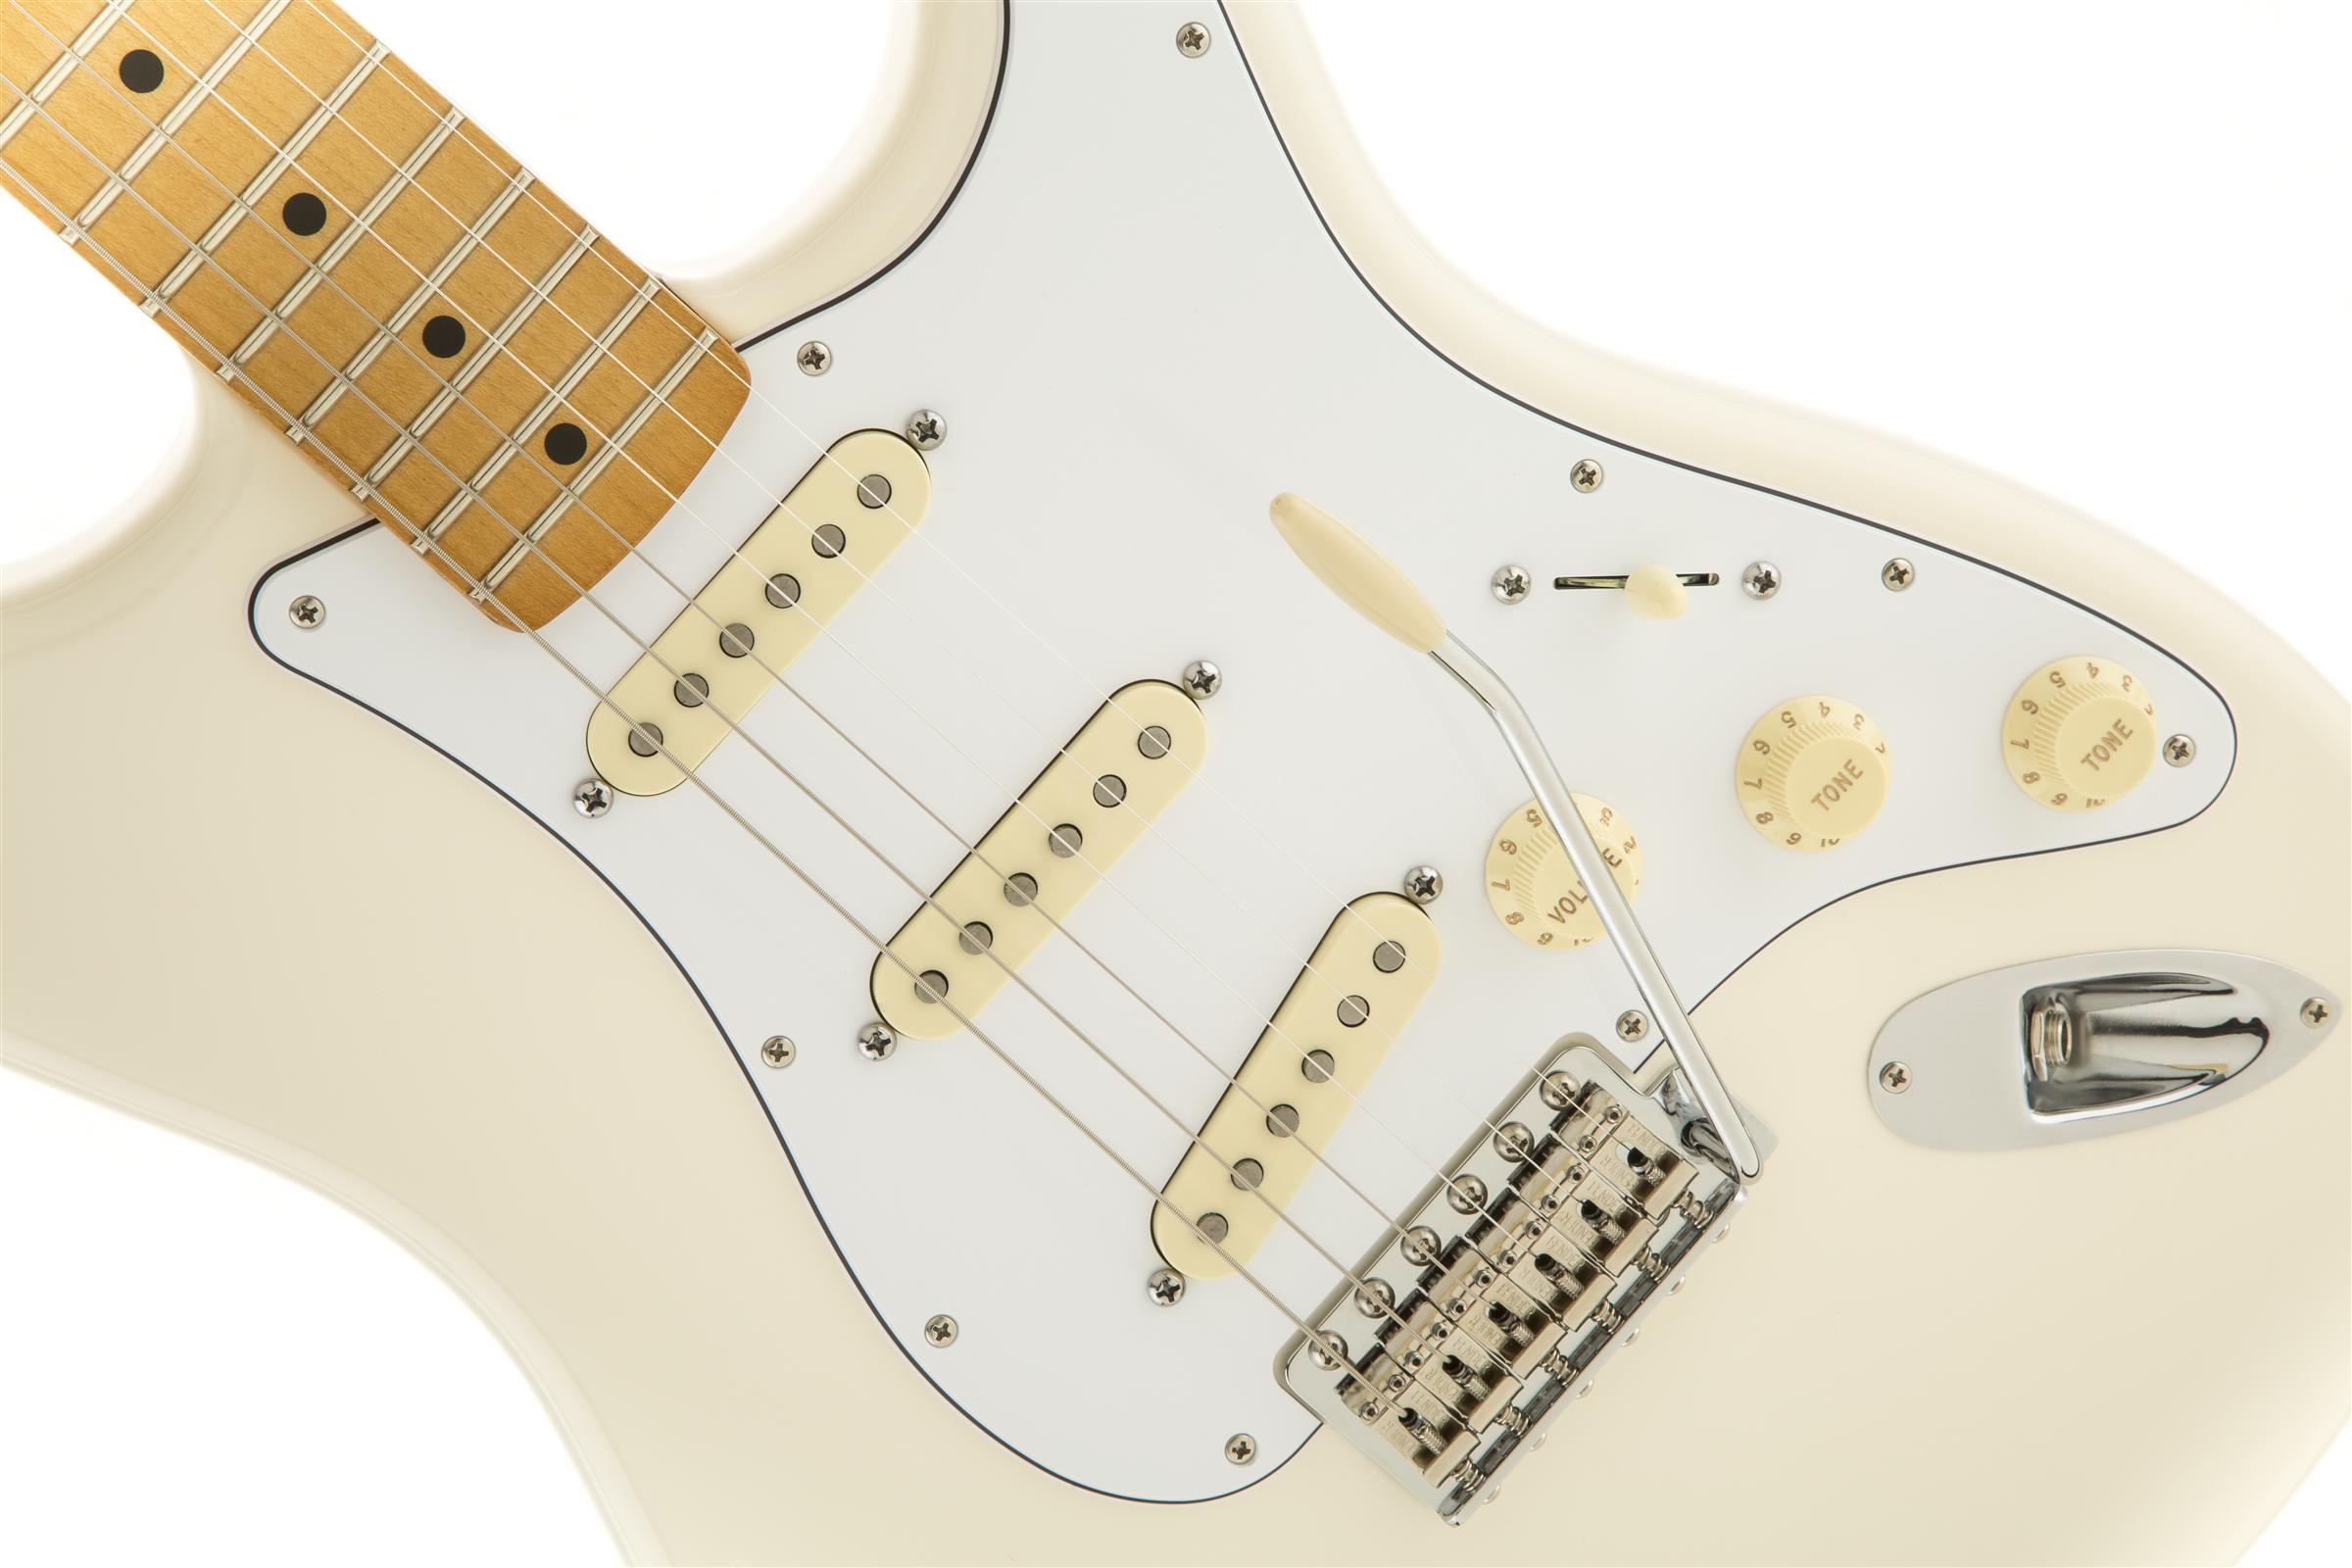 FENDER:  Jimi Hendrix Stratocaster 2015